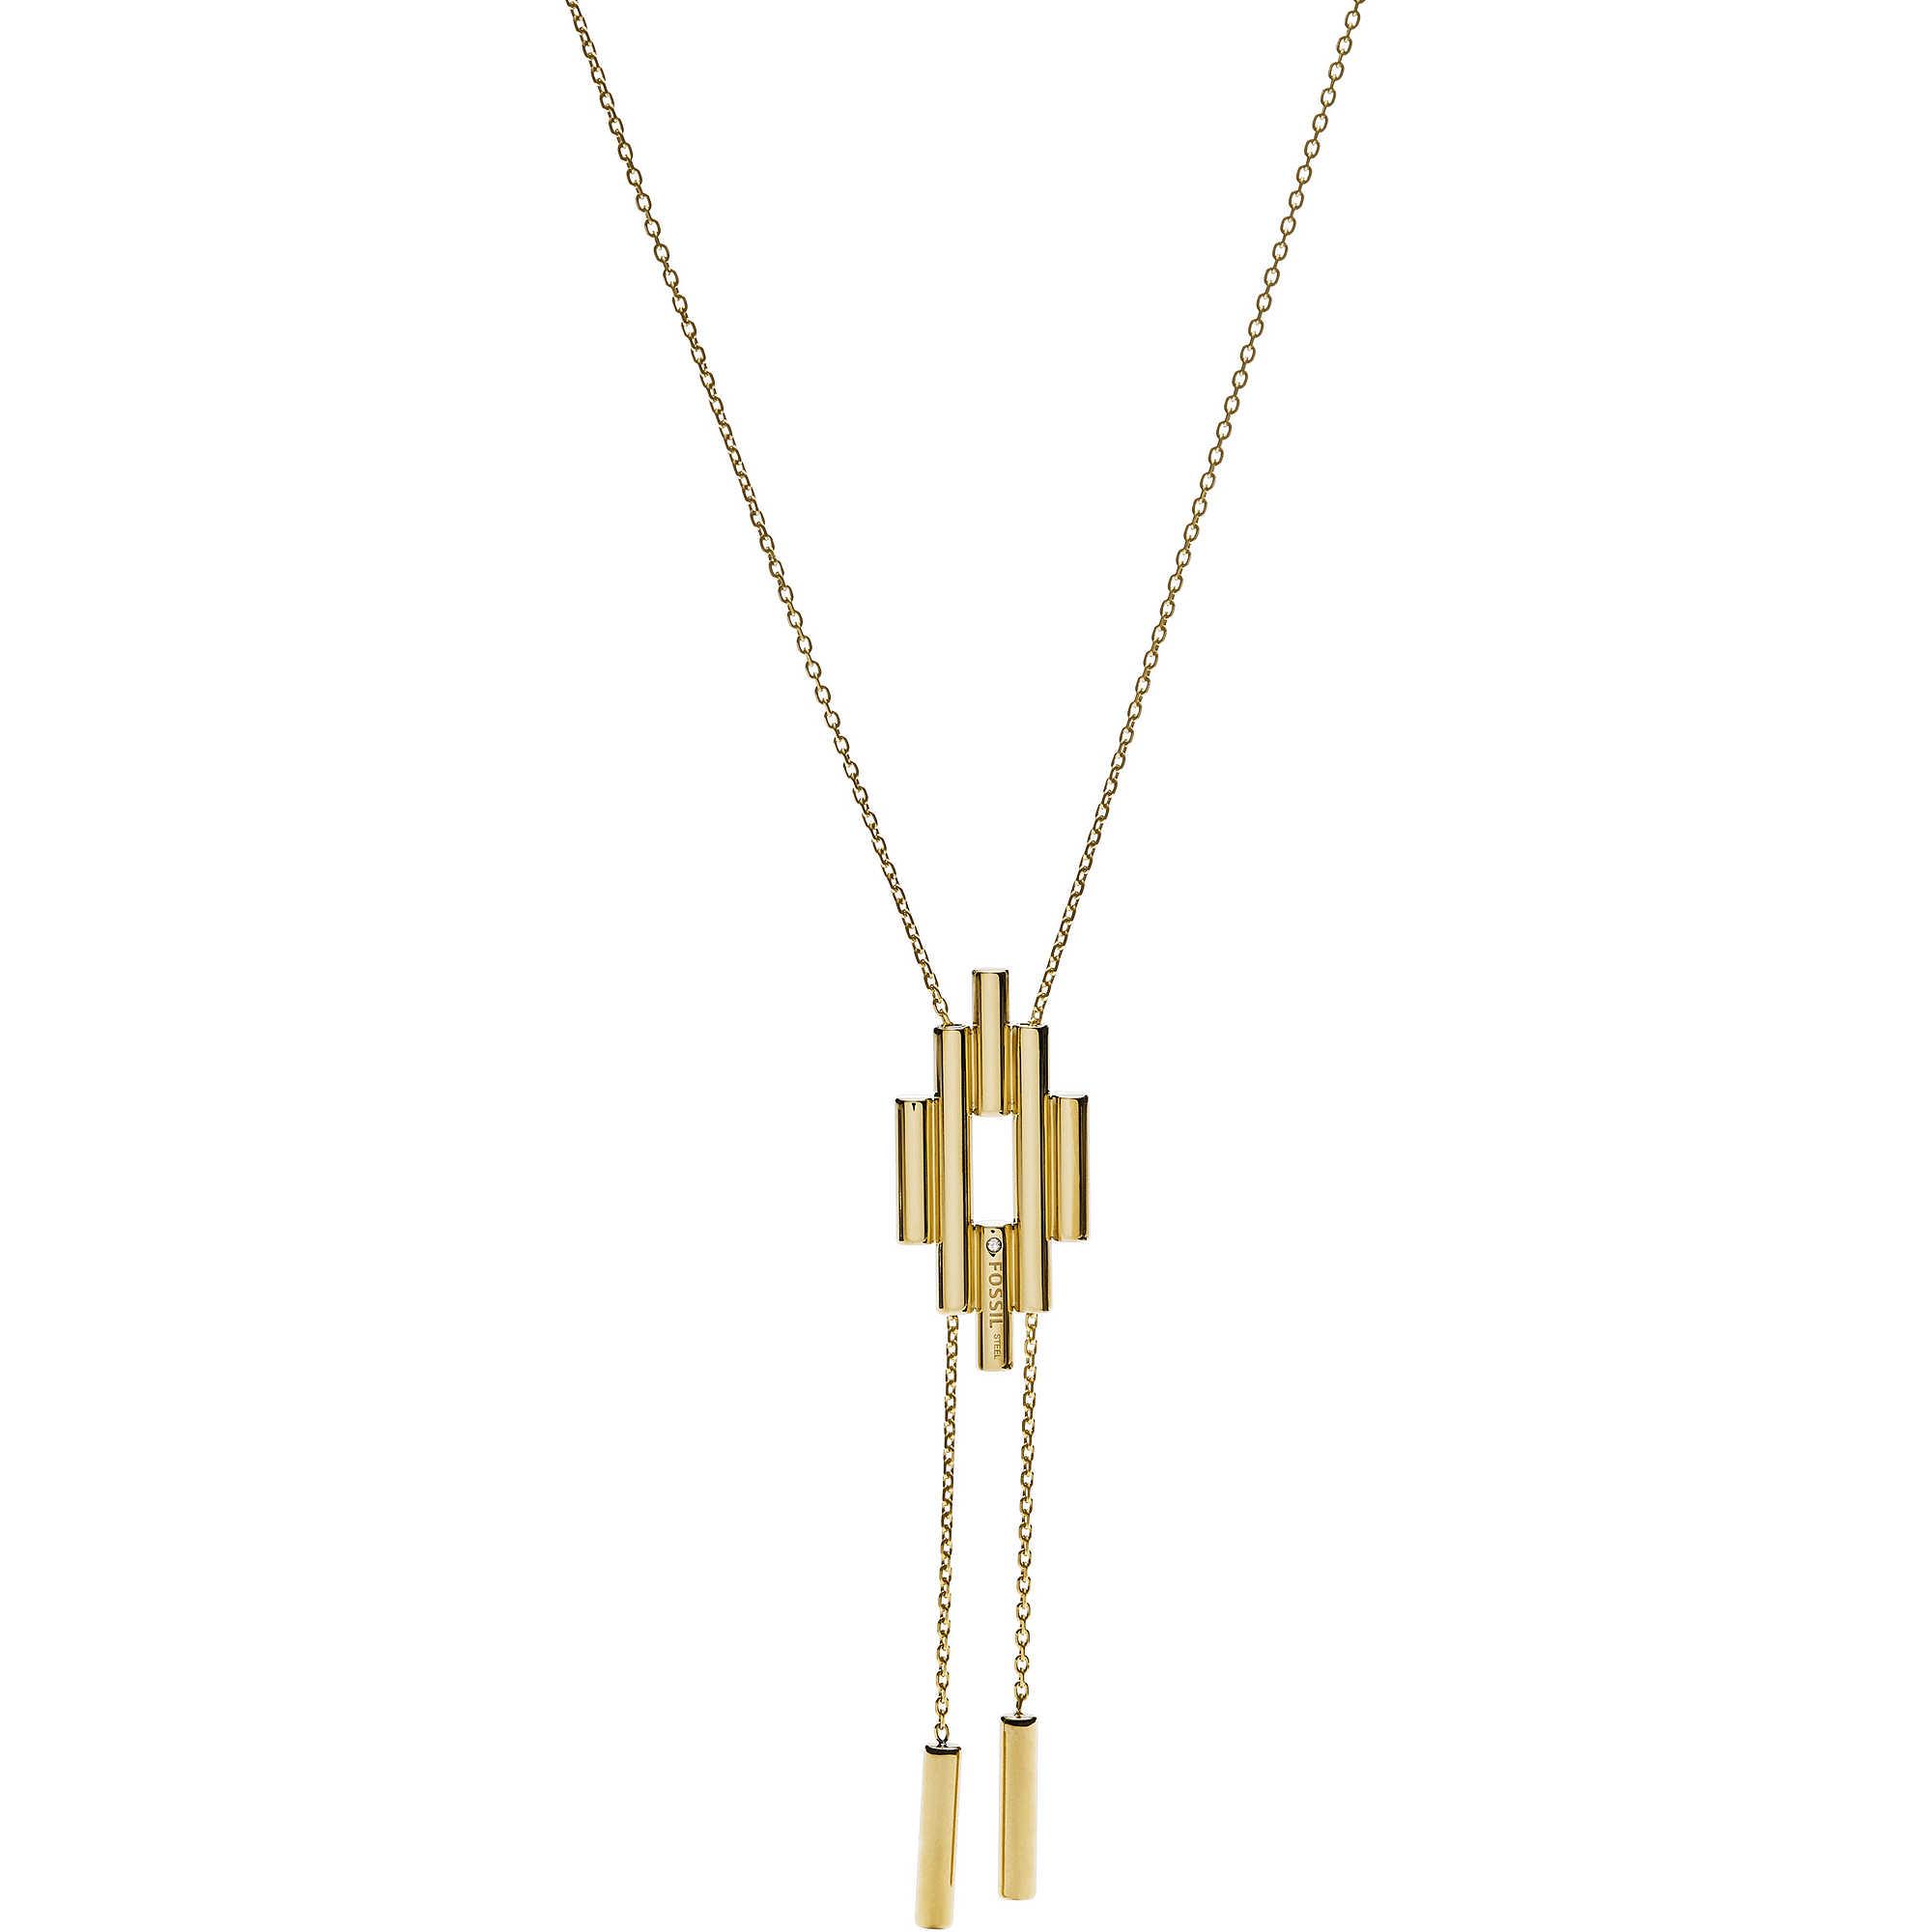 necklaces jewellery woman en ferrari zoom round lucy swarovski htm necklace